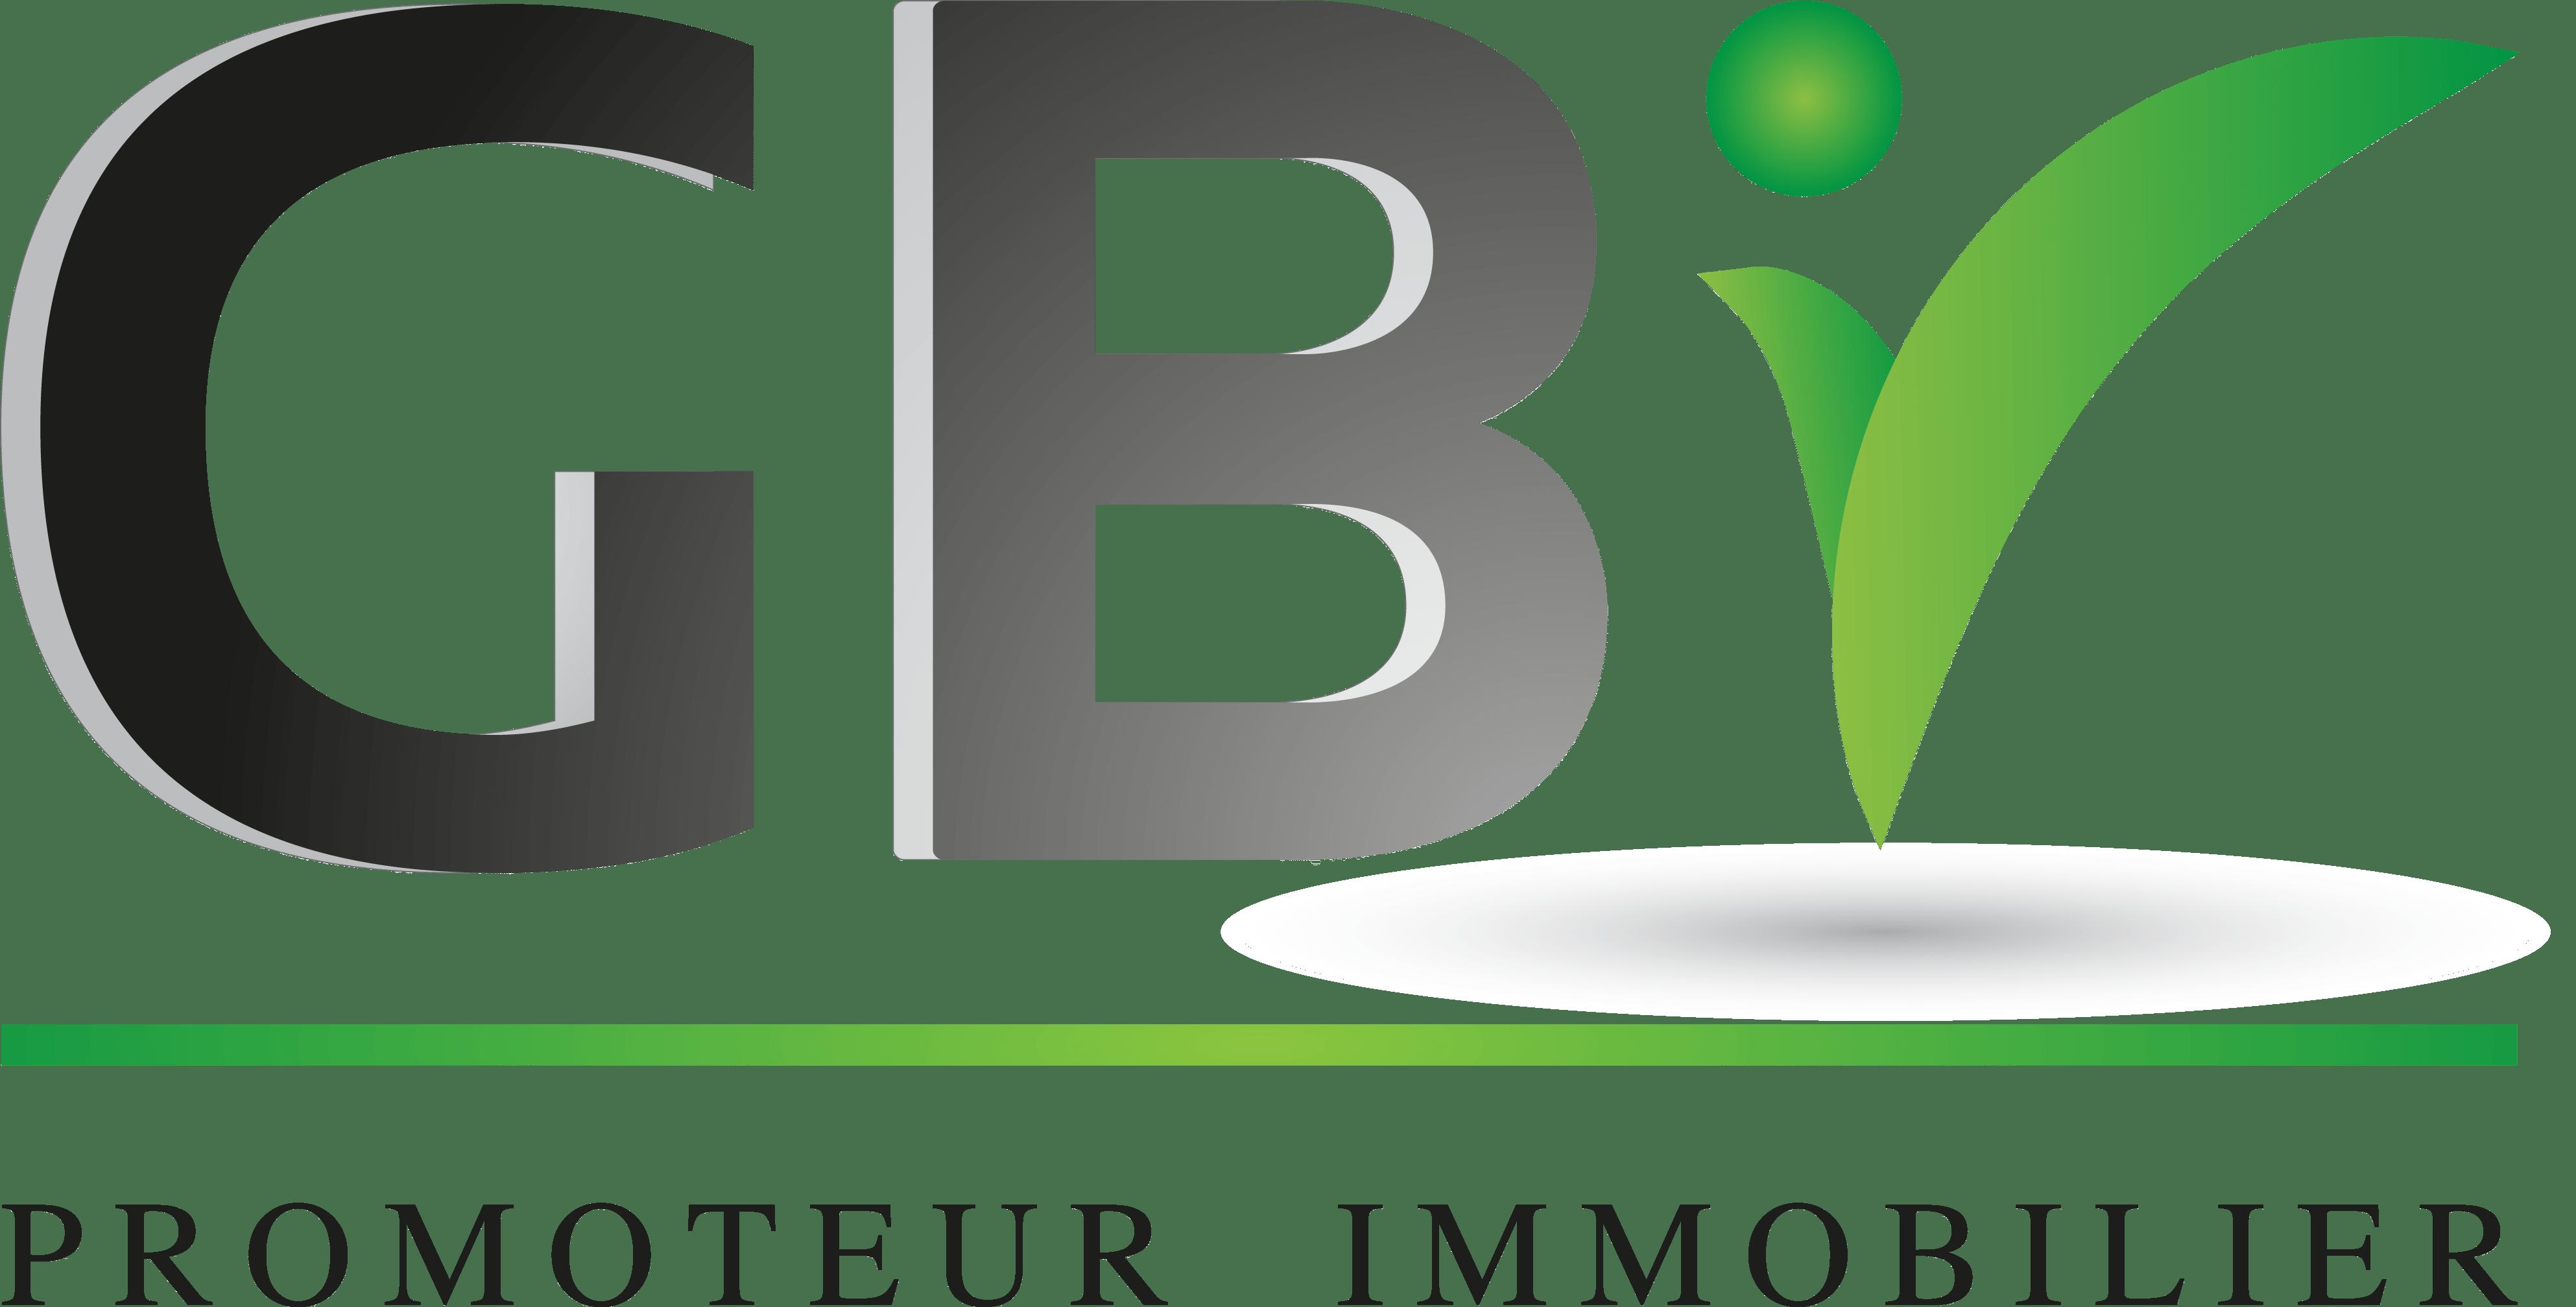 GBI Promotion